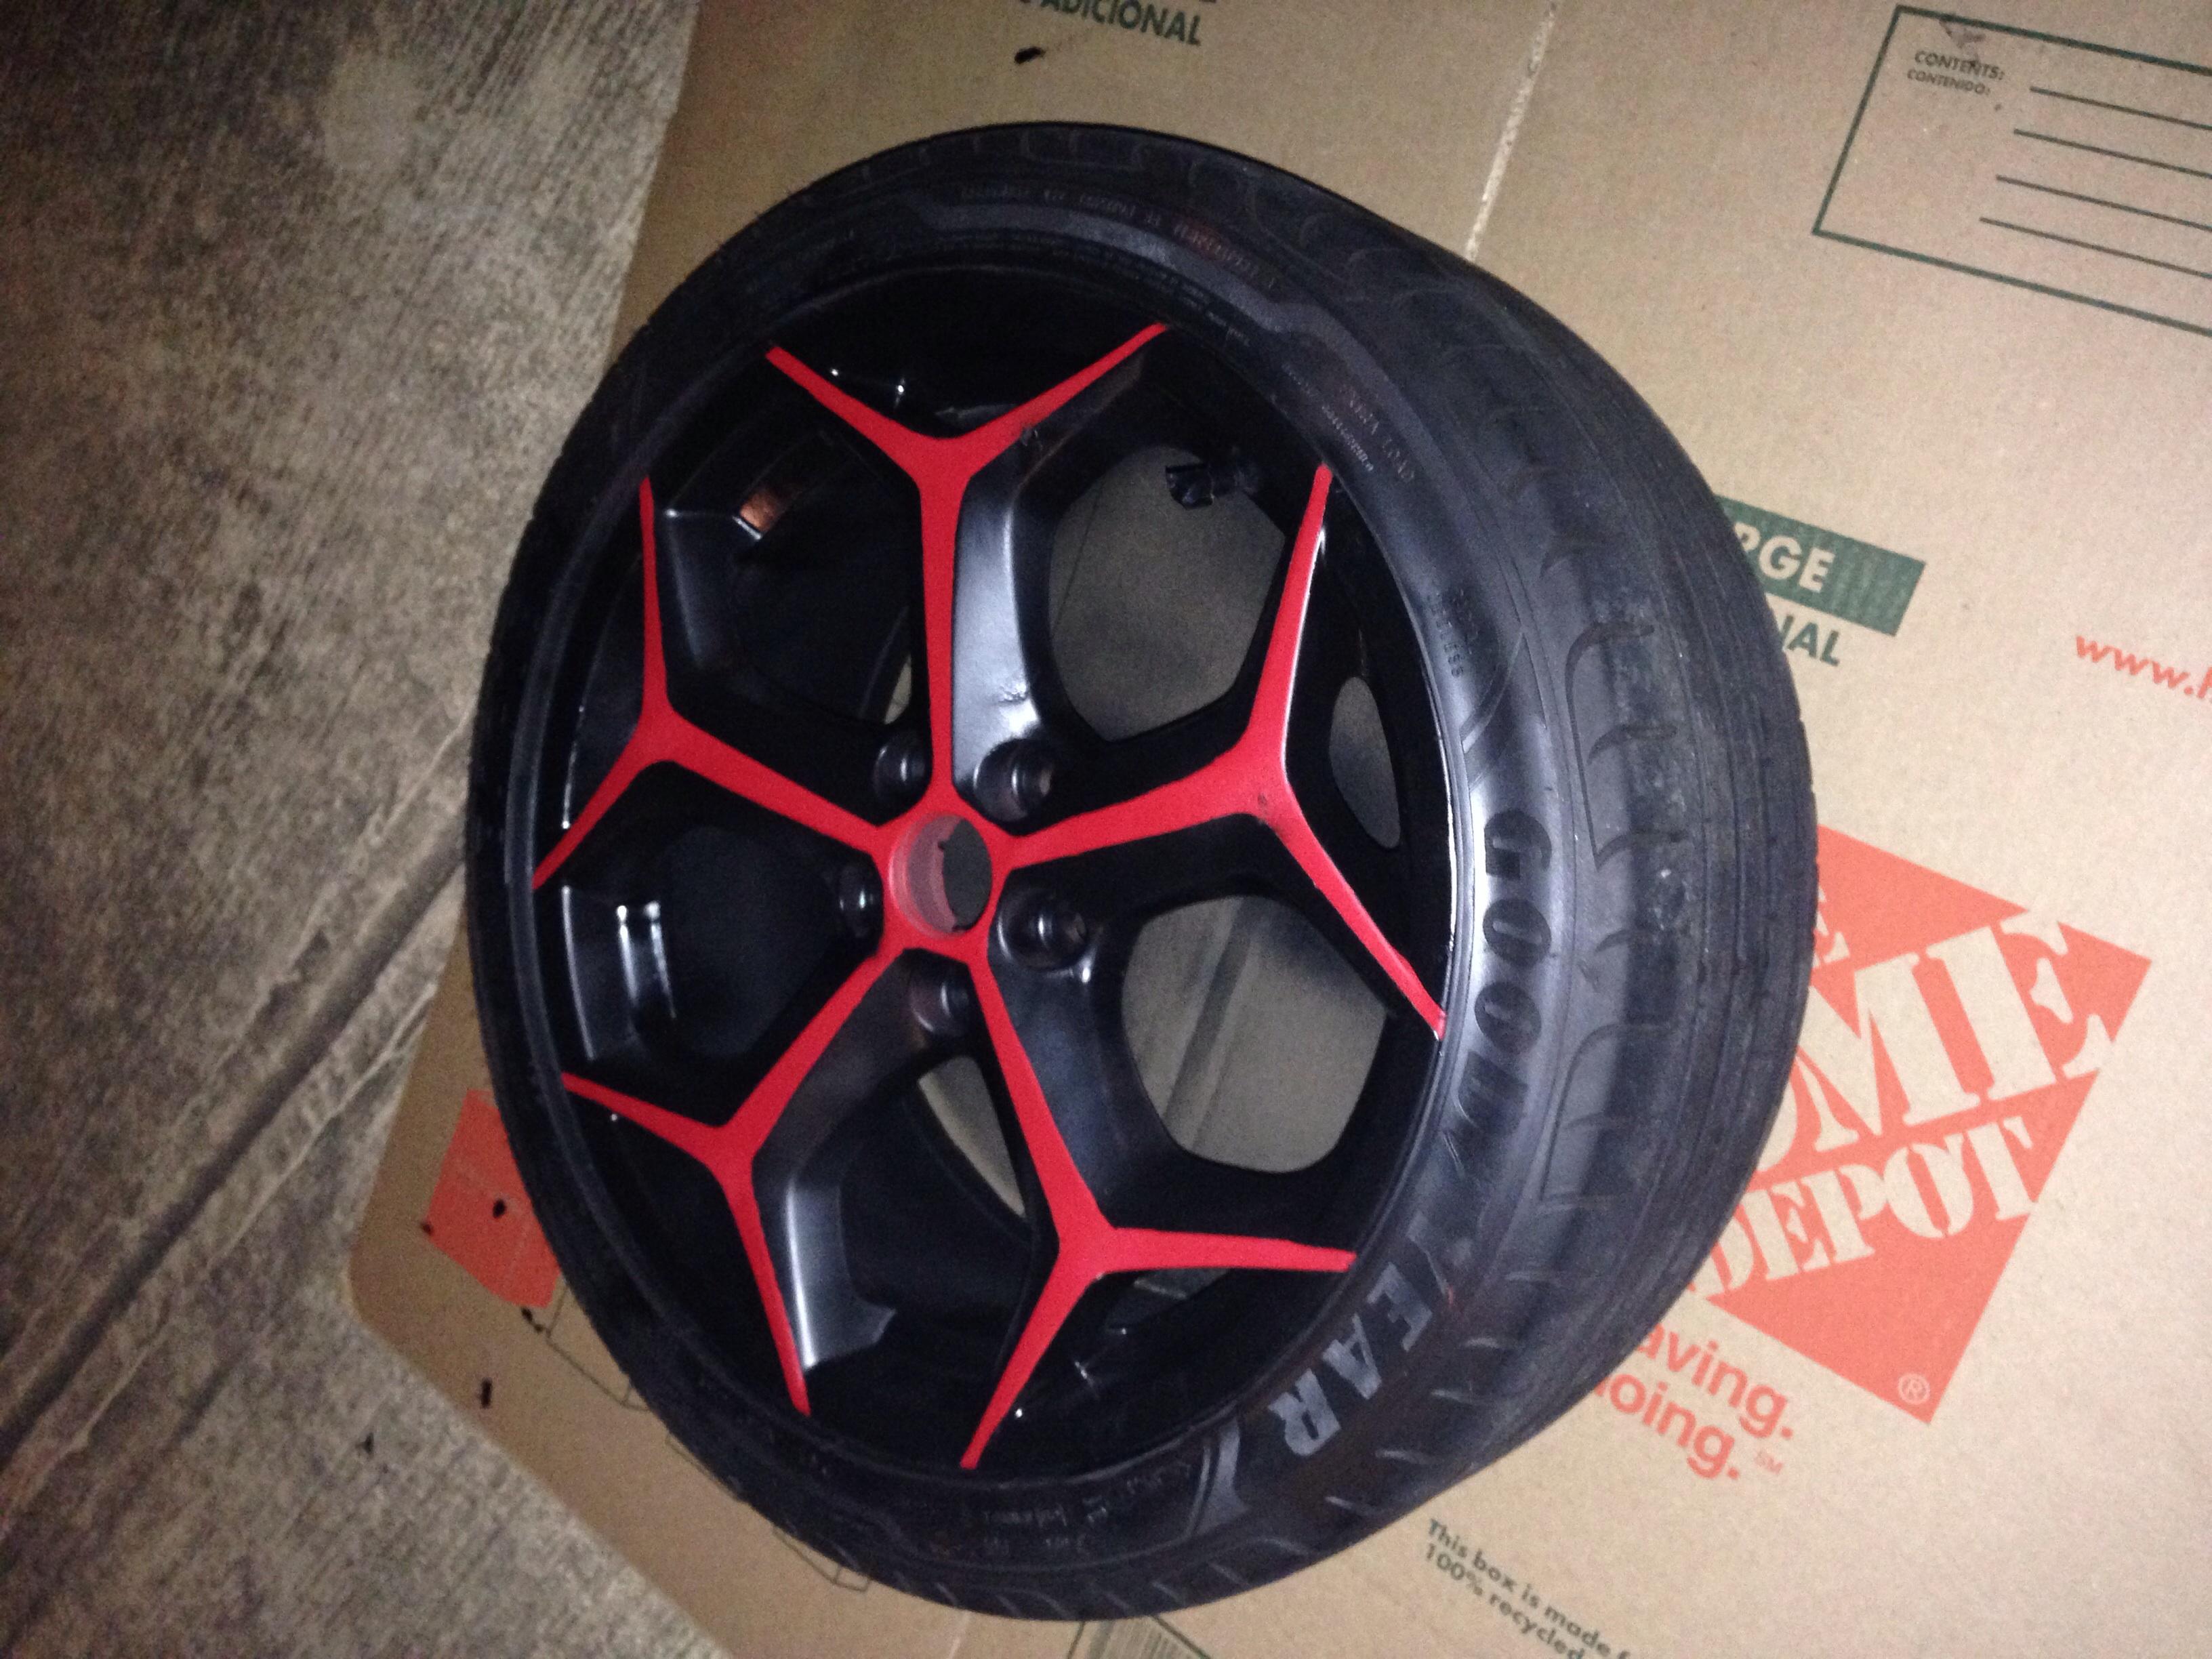 Custom two-tone plasti dipped OEM wheels - opinions?